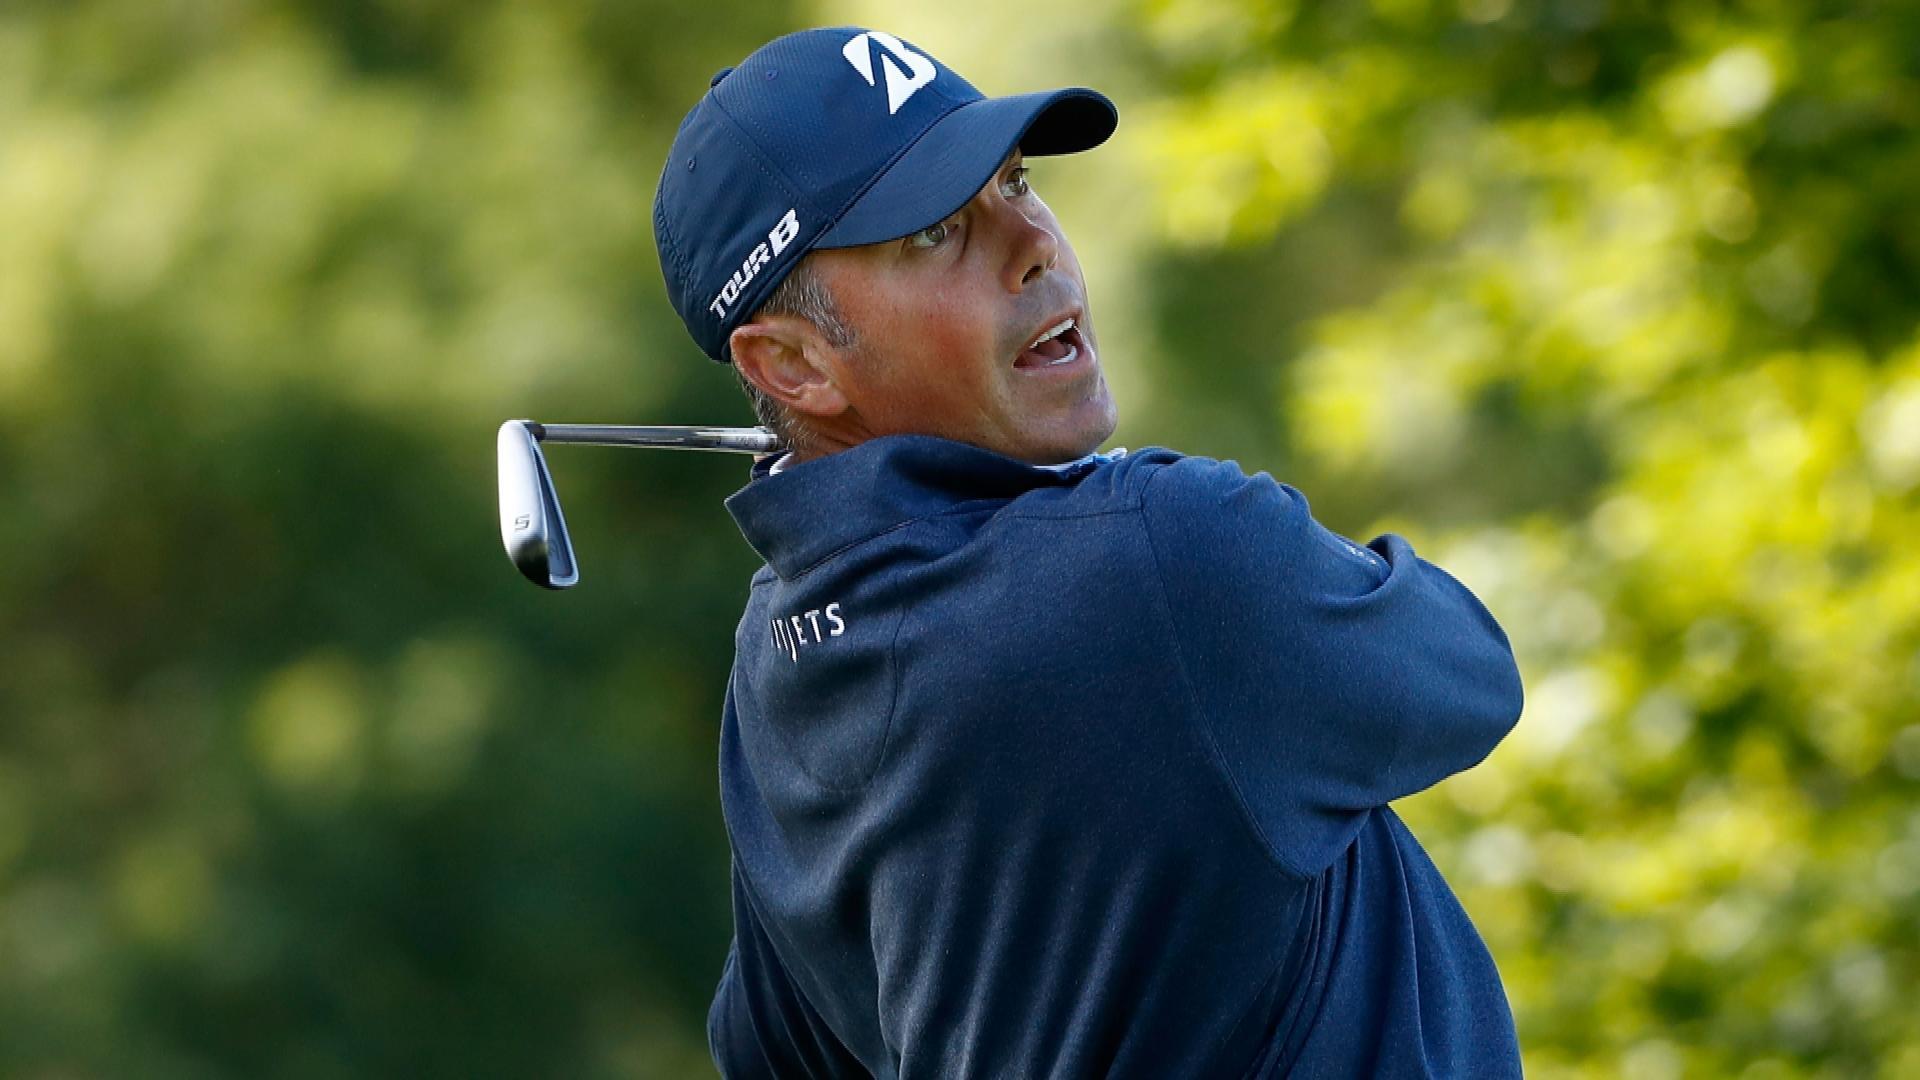 Pin on Golf News